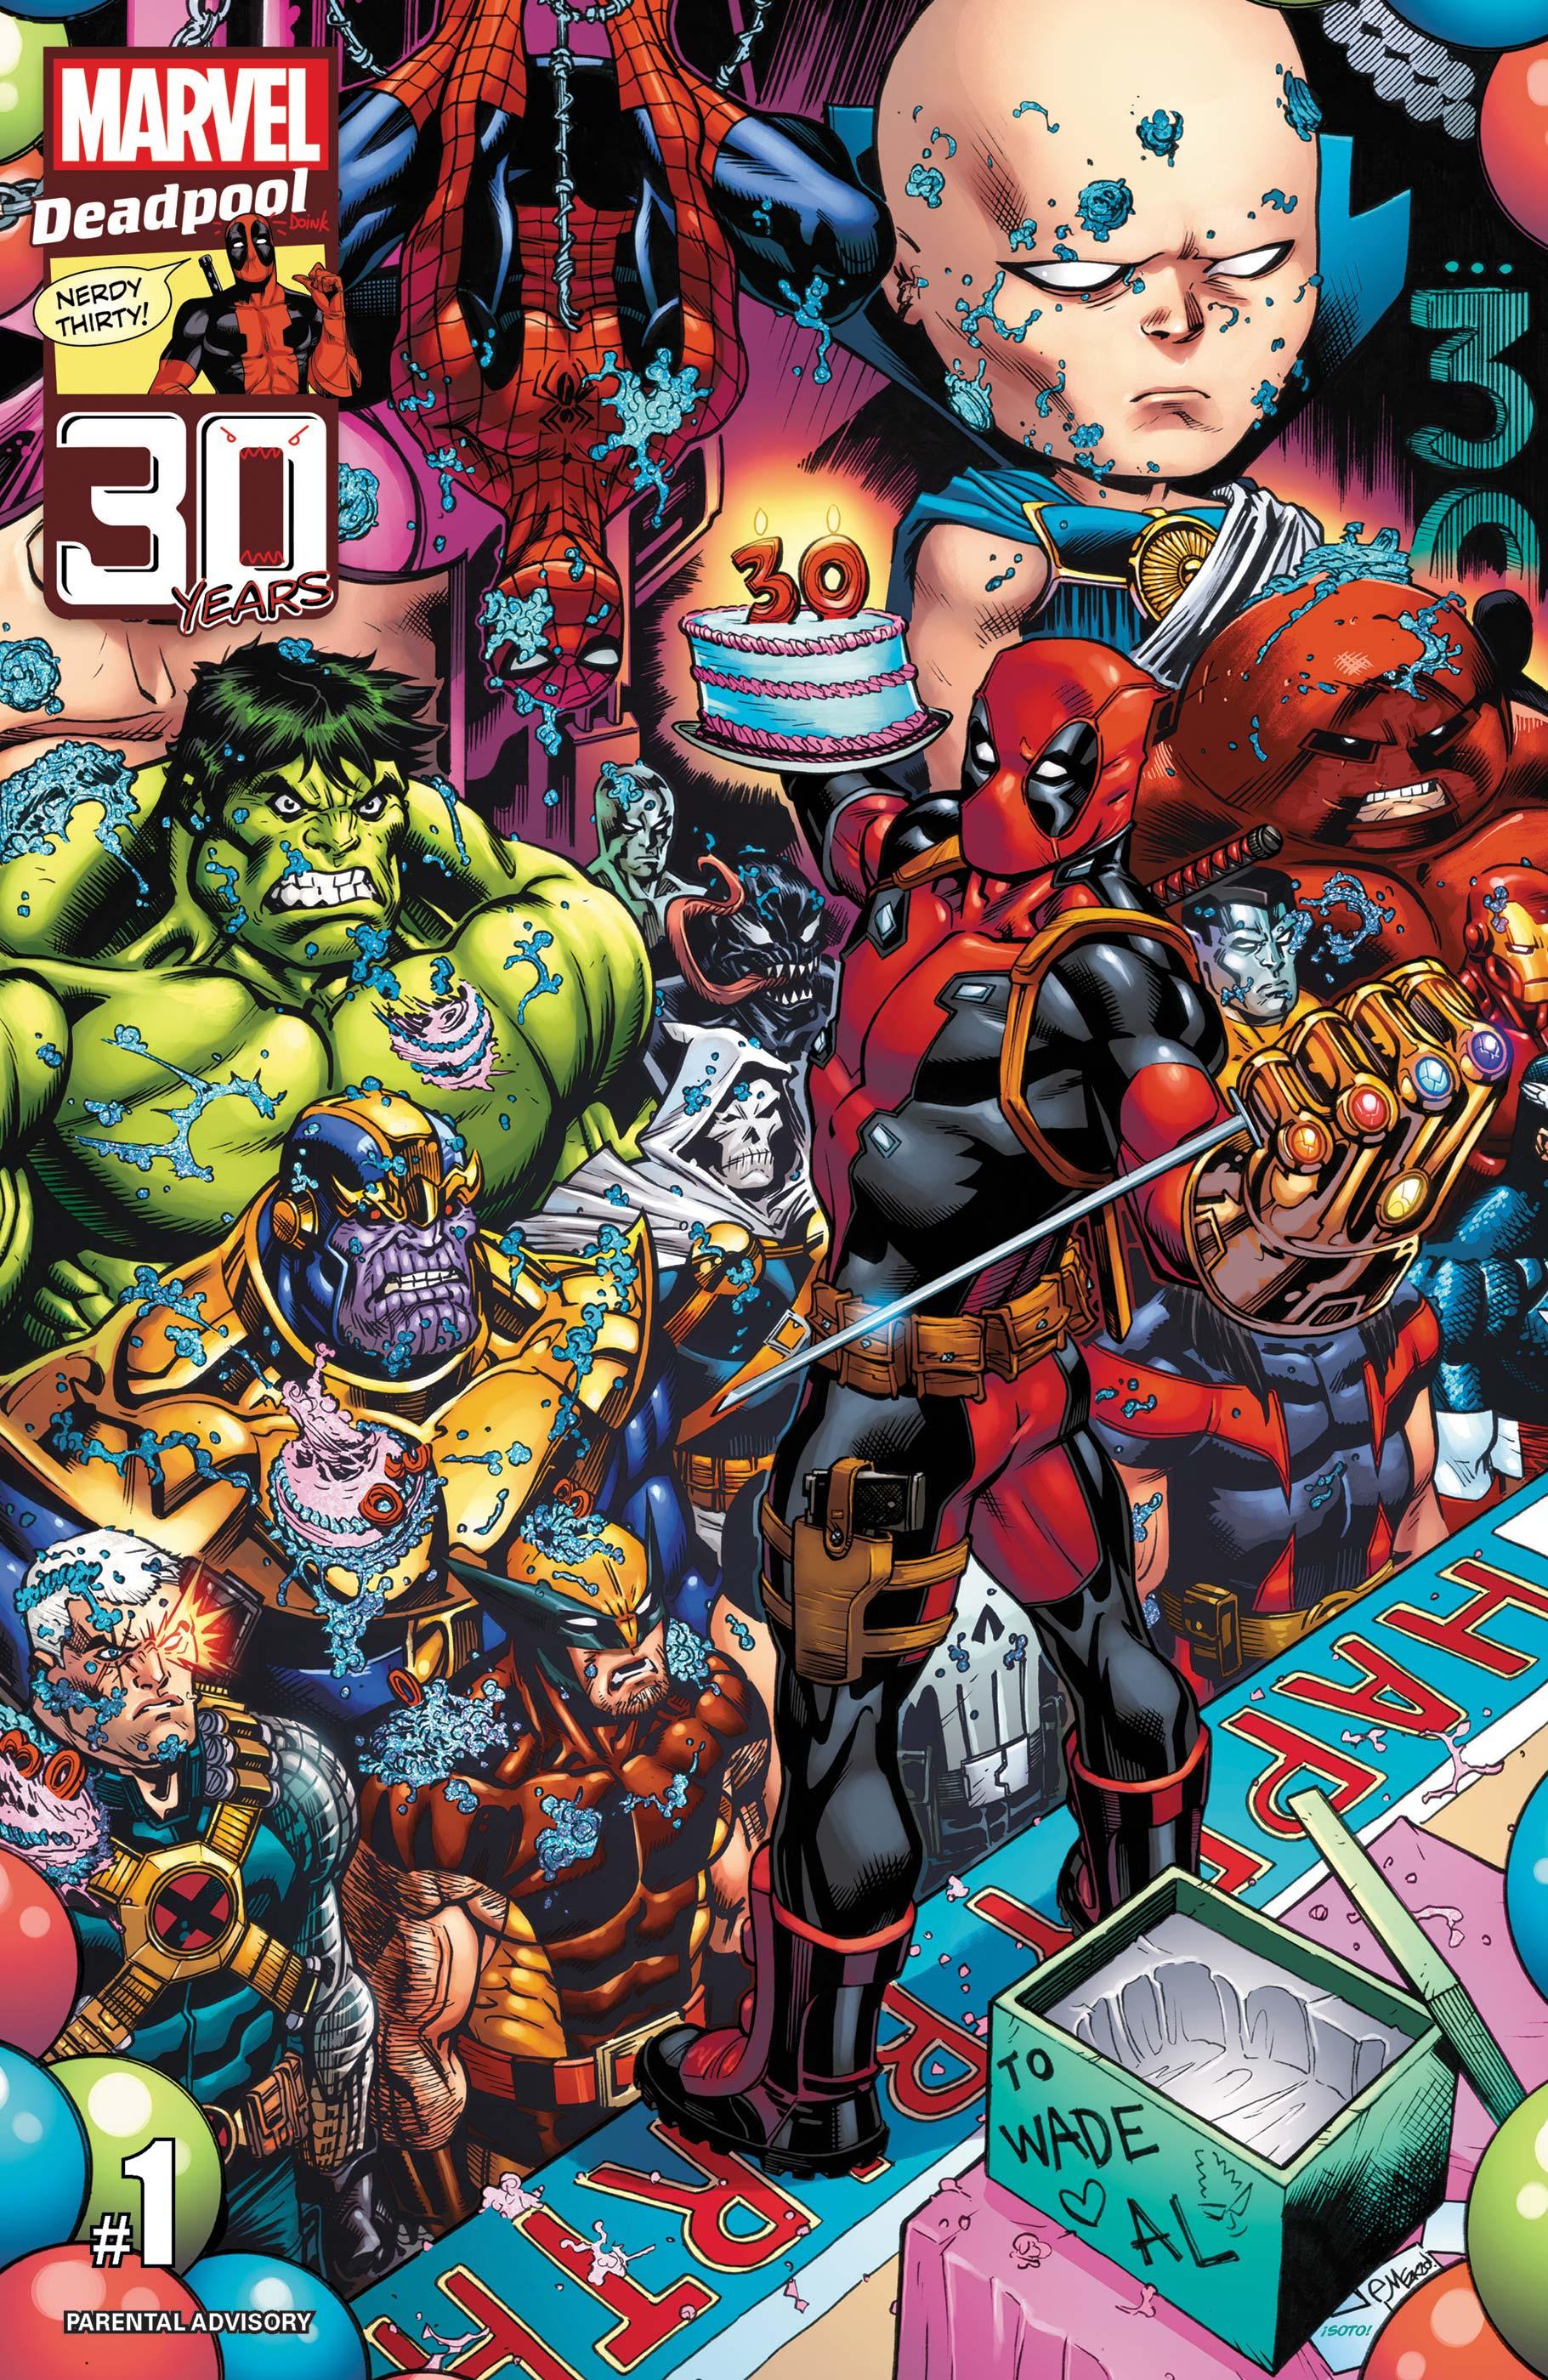 Deadpool Nerdy 30 (2021) #1